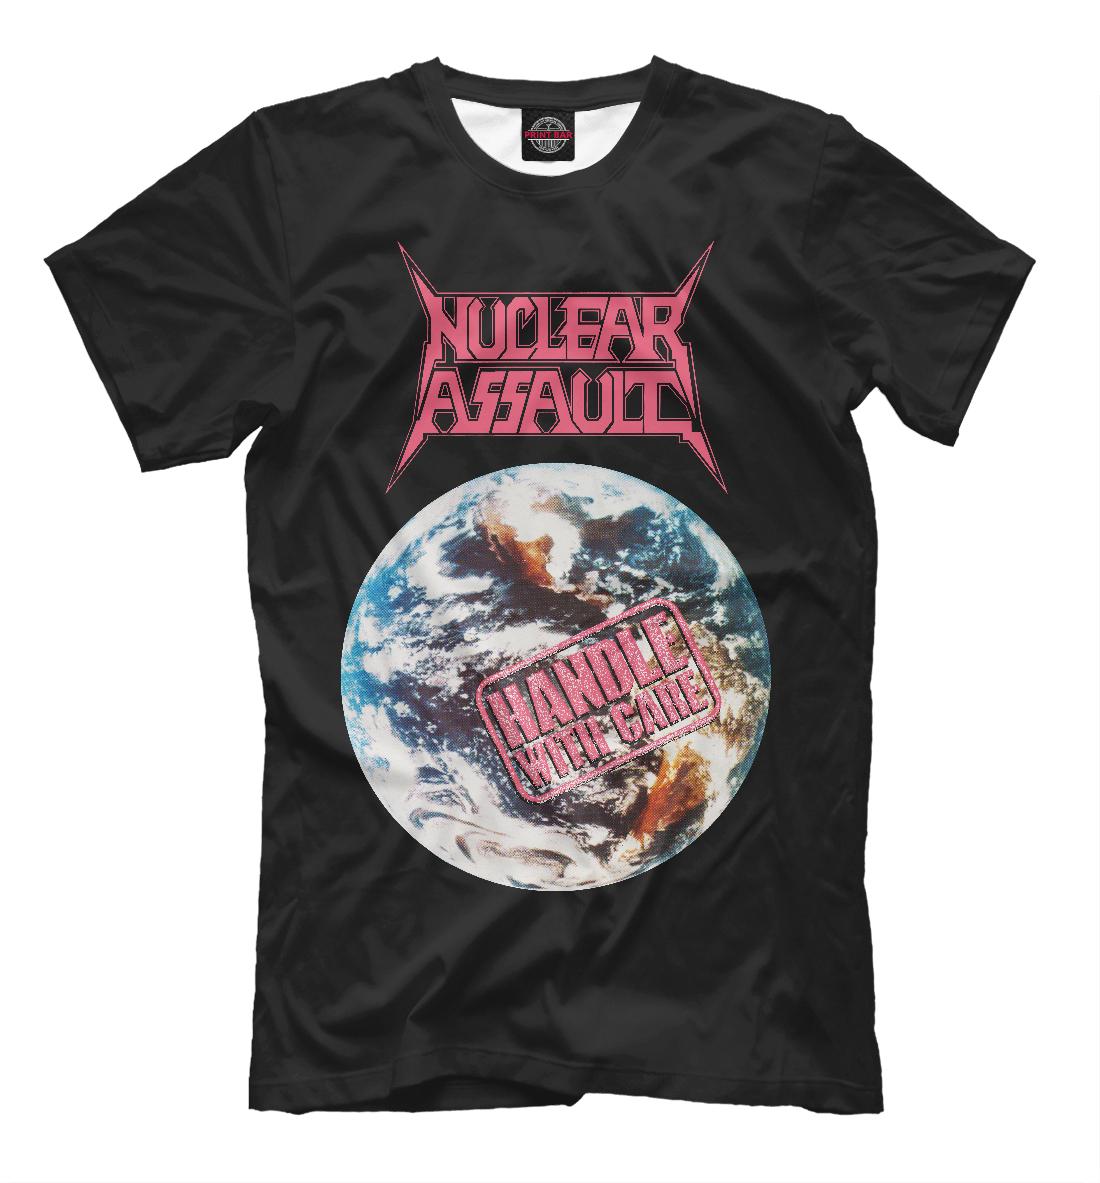 Купить Nuclear Assault: Handle With Care, Printbar, Футболки, MZK-471484-fut-2